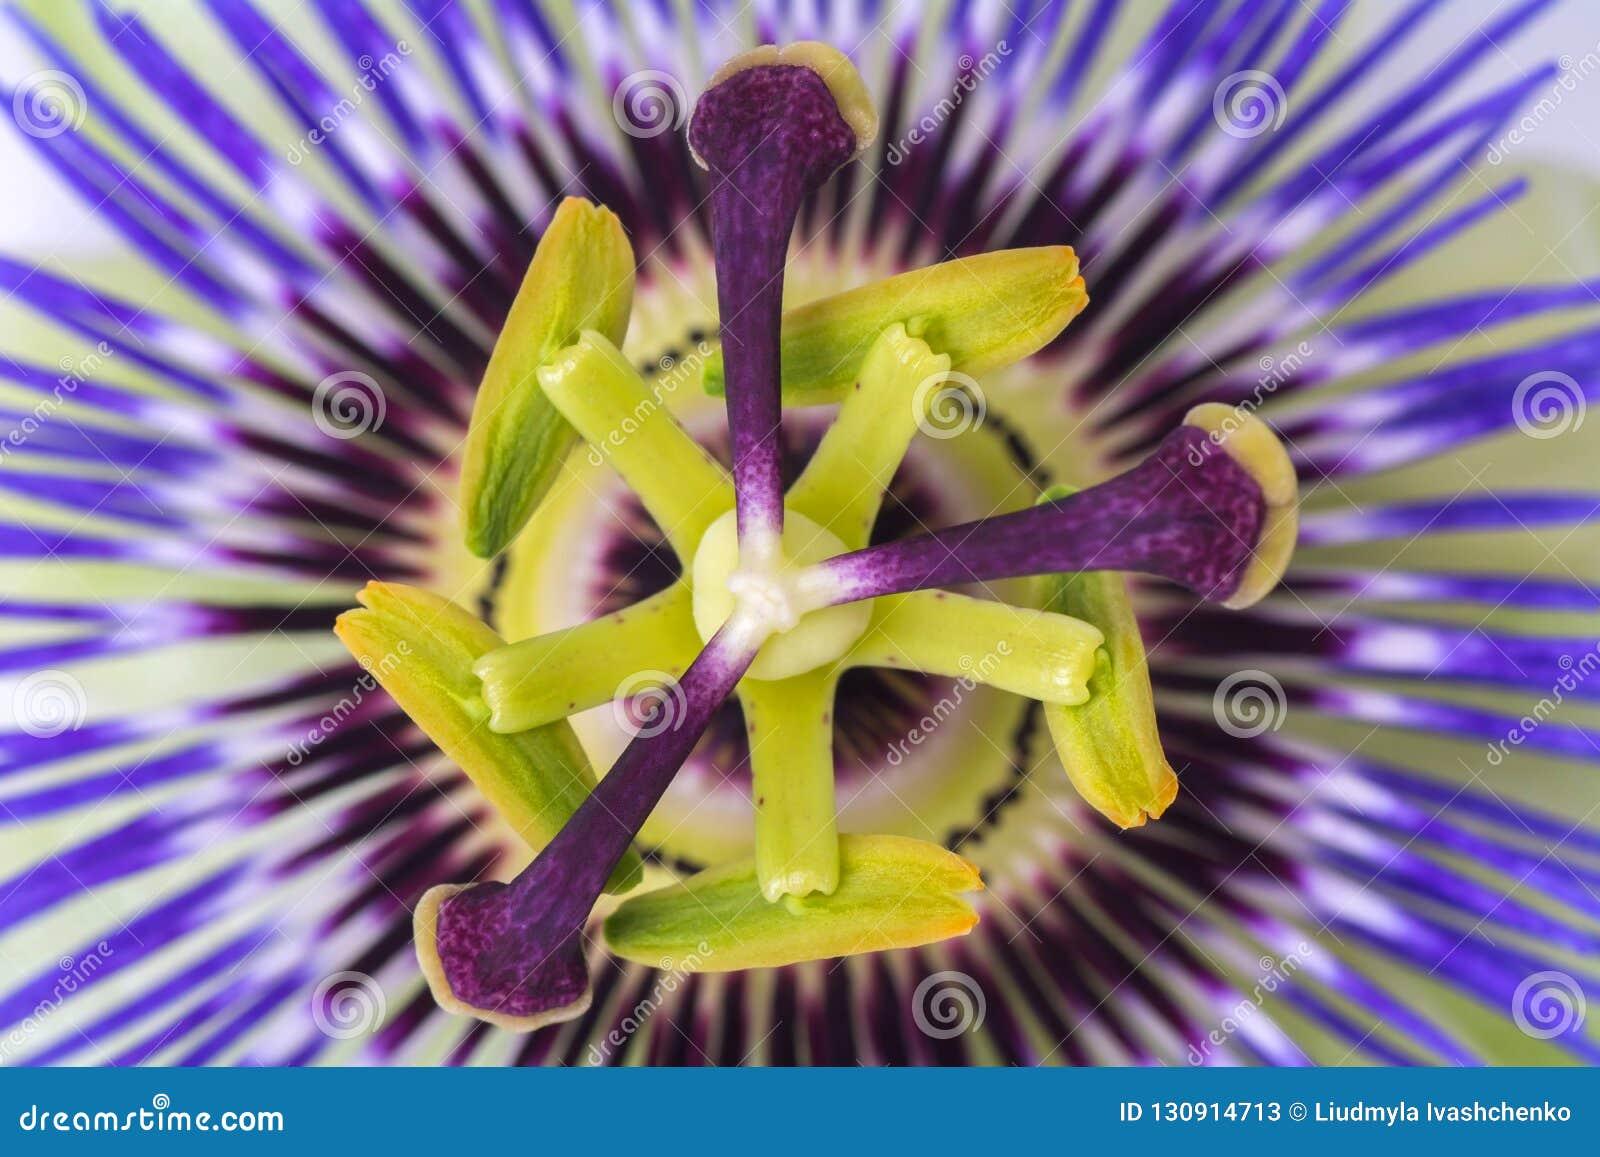 Fin de passiflore de passiflore  grande belle fleur